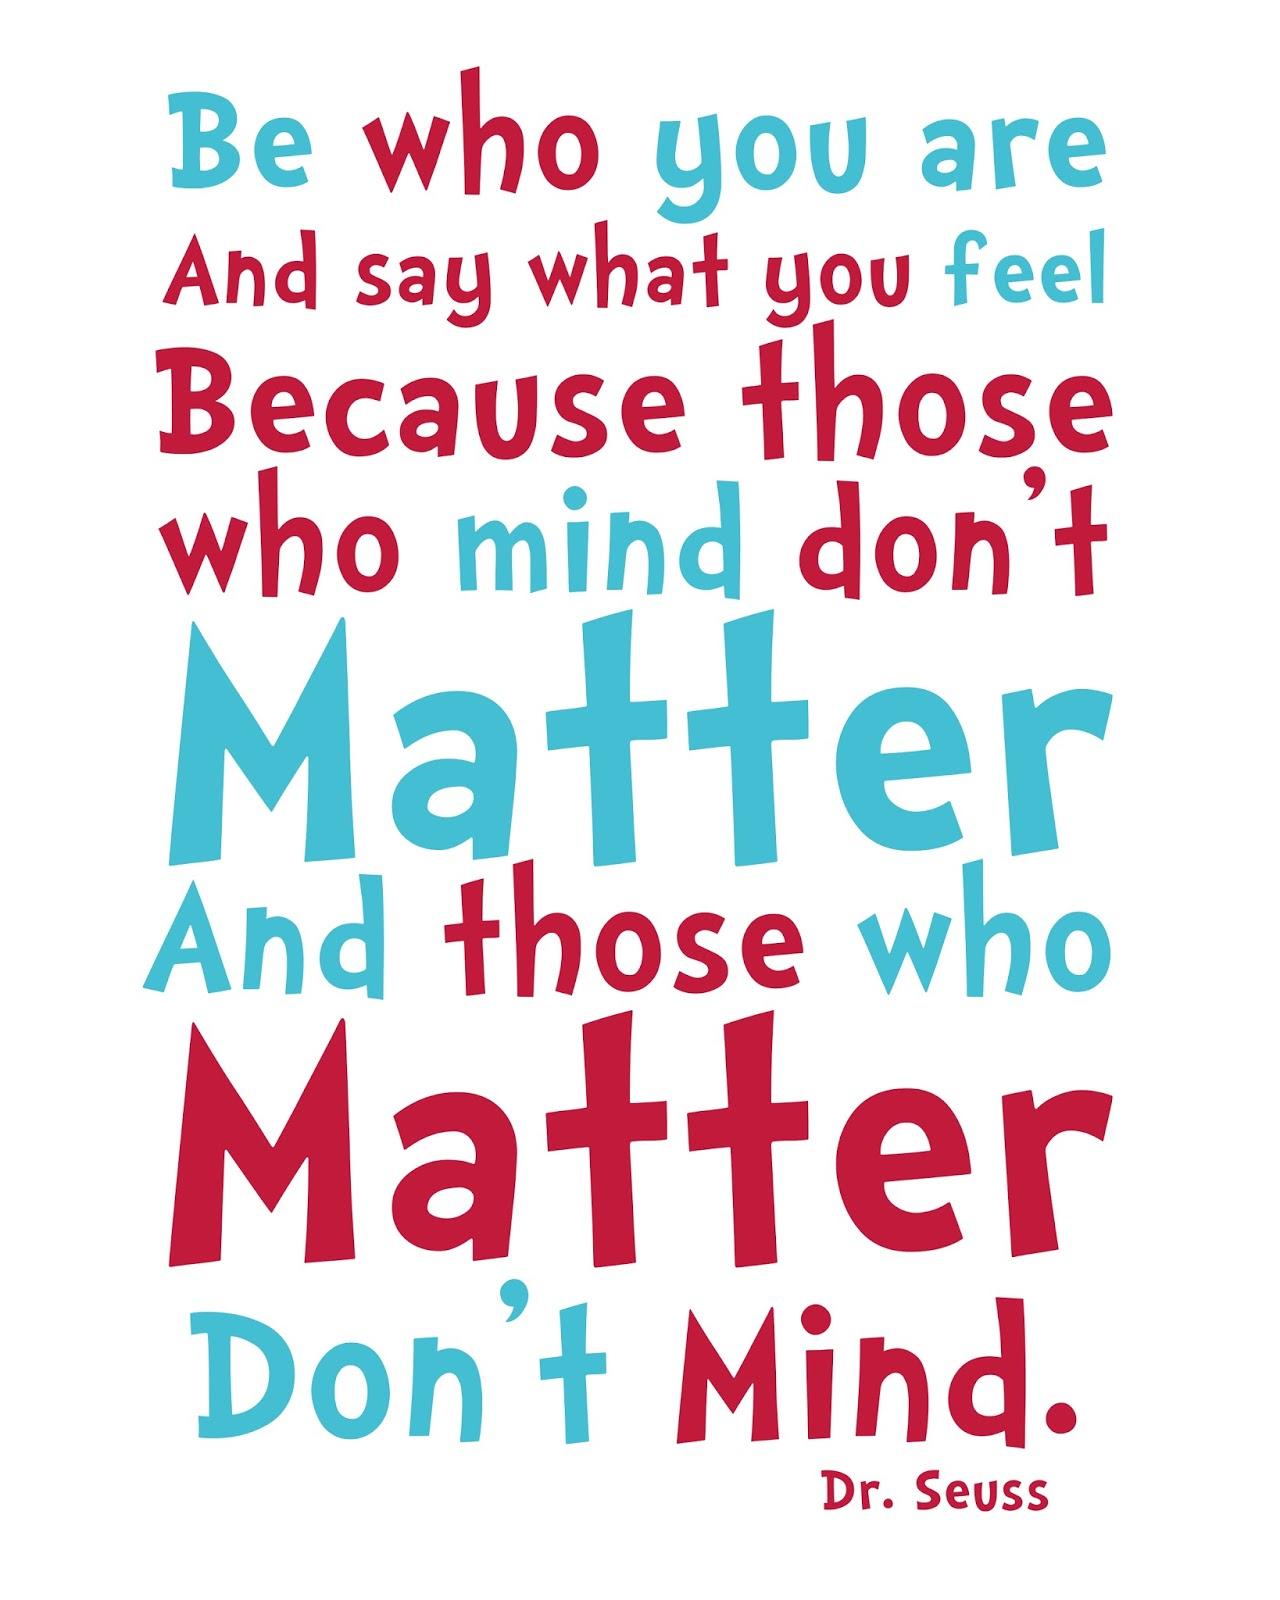 photo regarding Printable Dr.seuss Quotes titled Dr. Seuss Quotation Printable and Actions for little ones - Guidelines